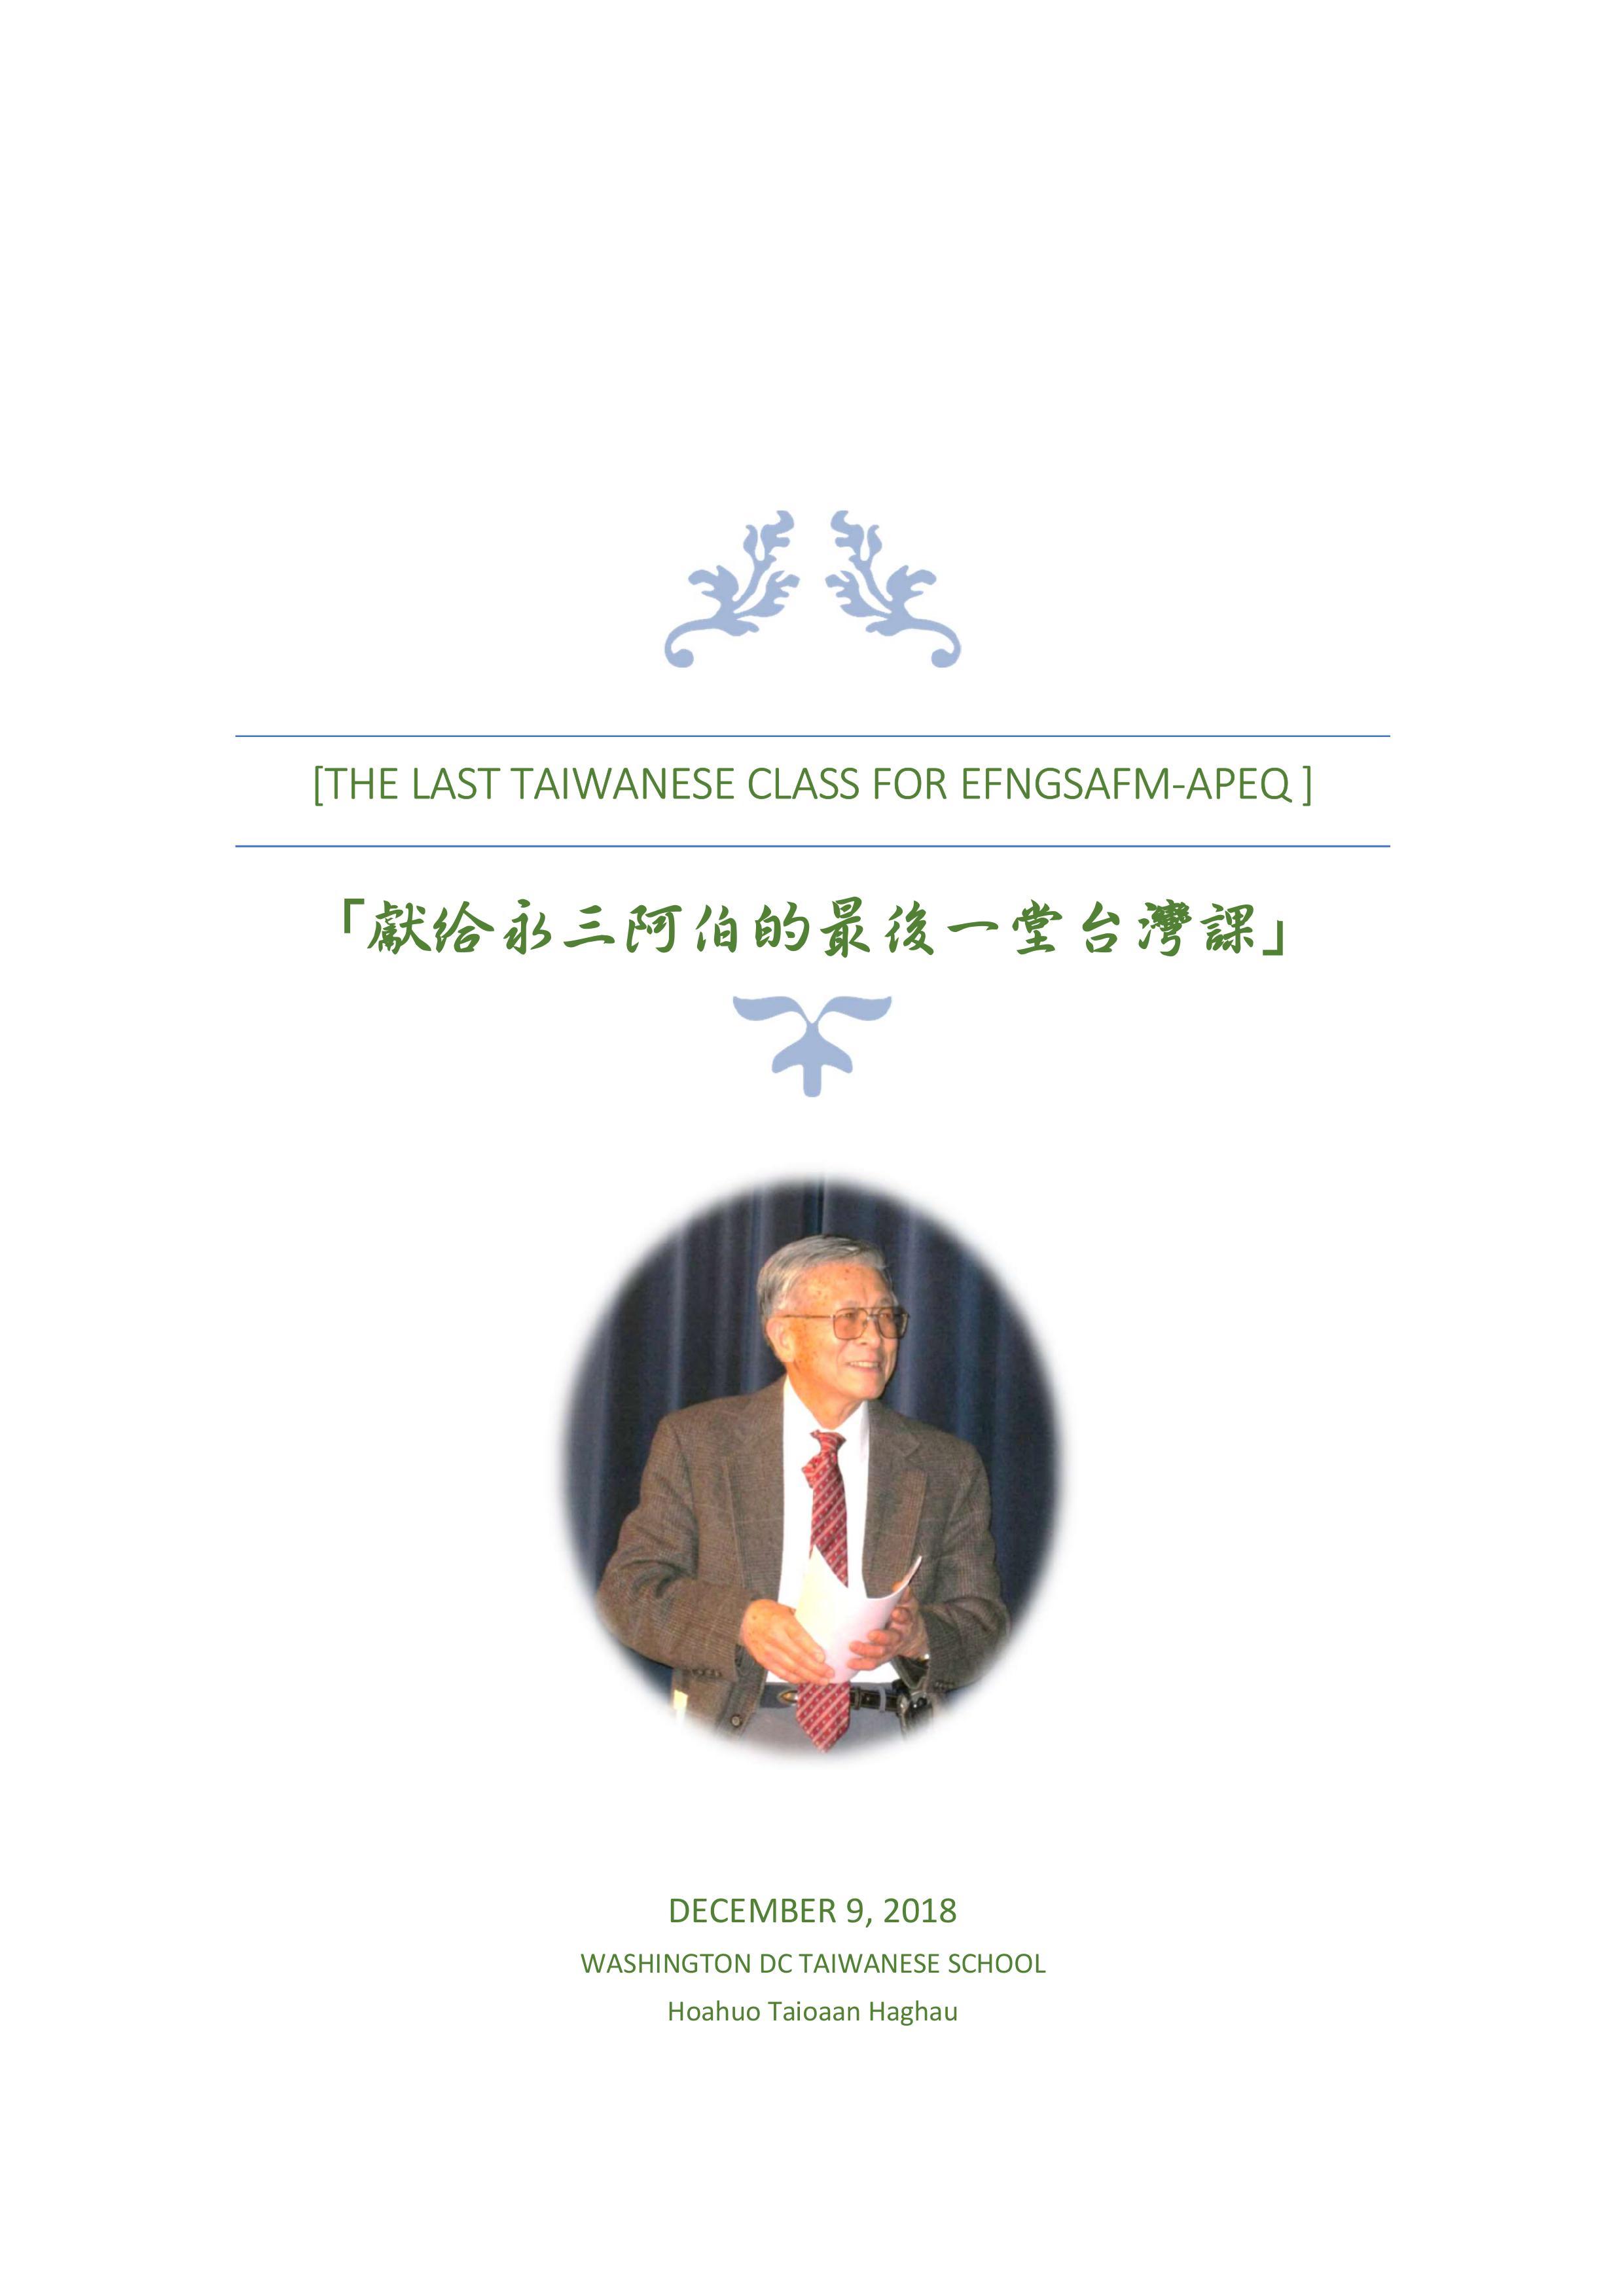 138. In Memory of Dr. Yung-San Liang 梁永三 博士生命的禮讚